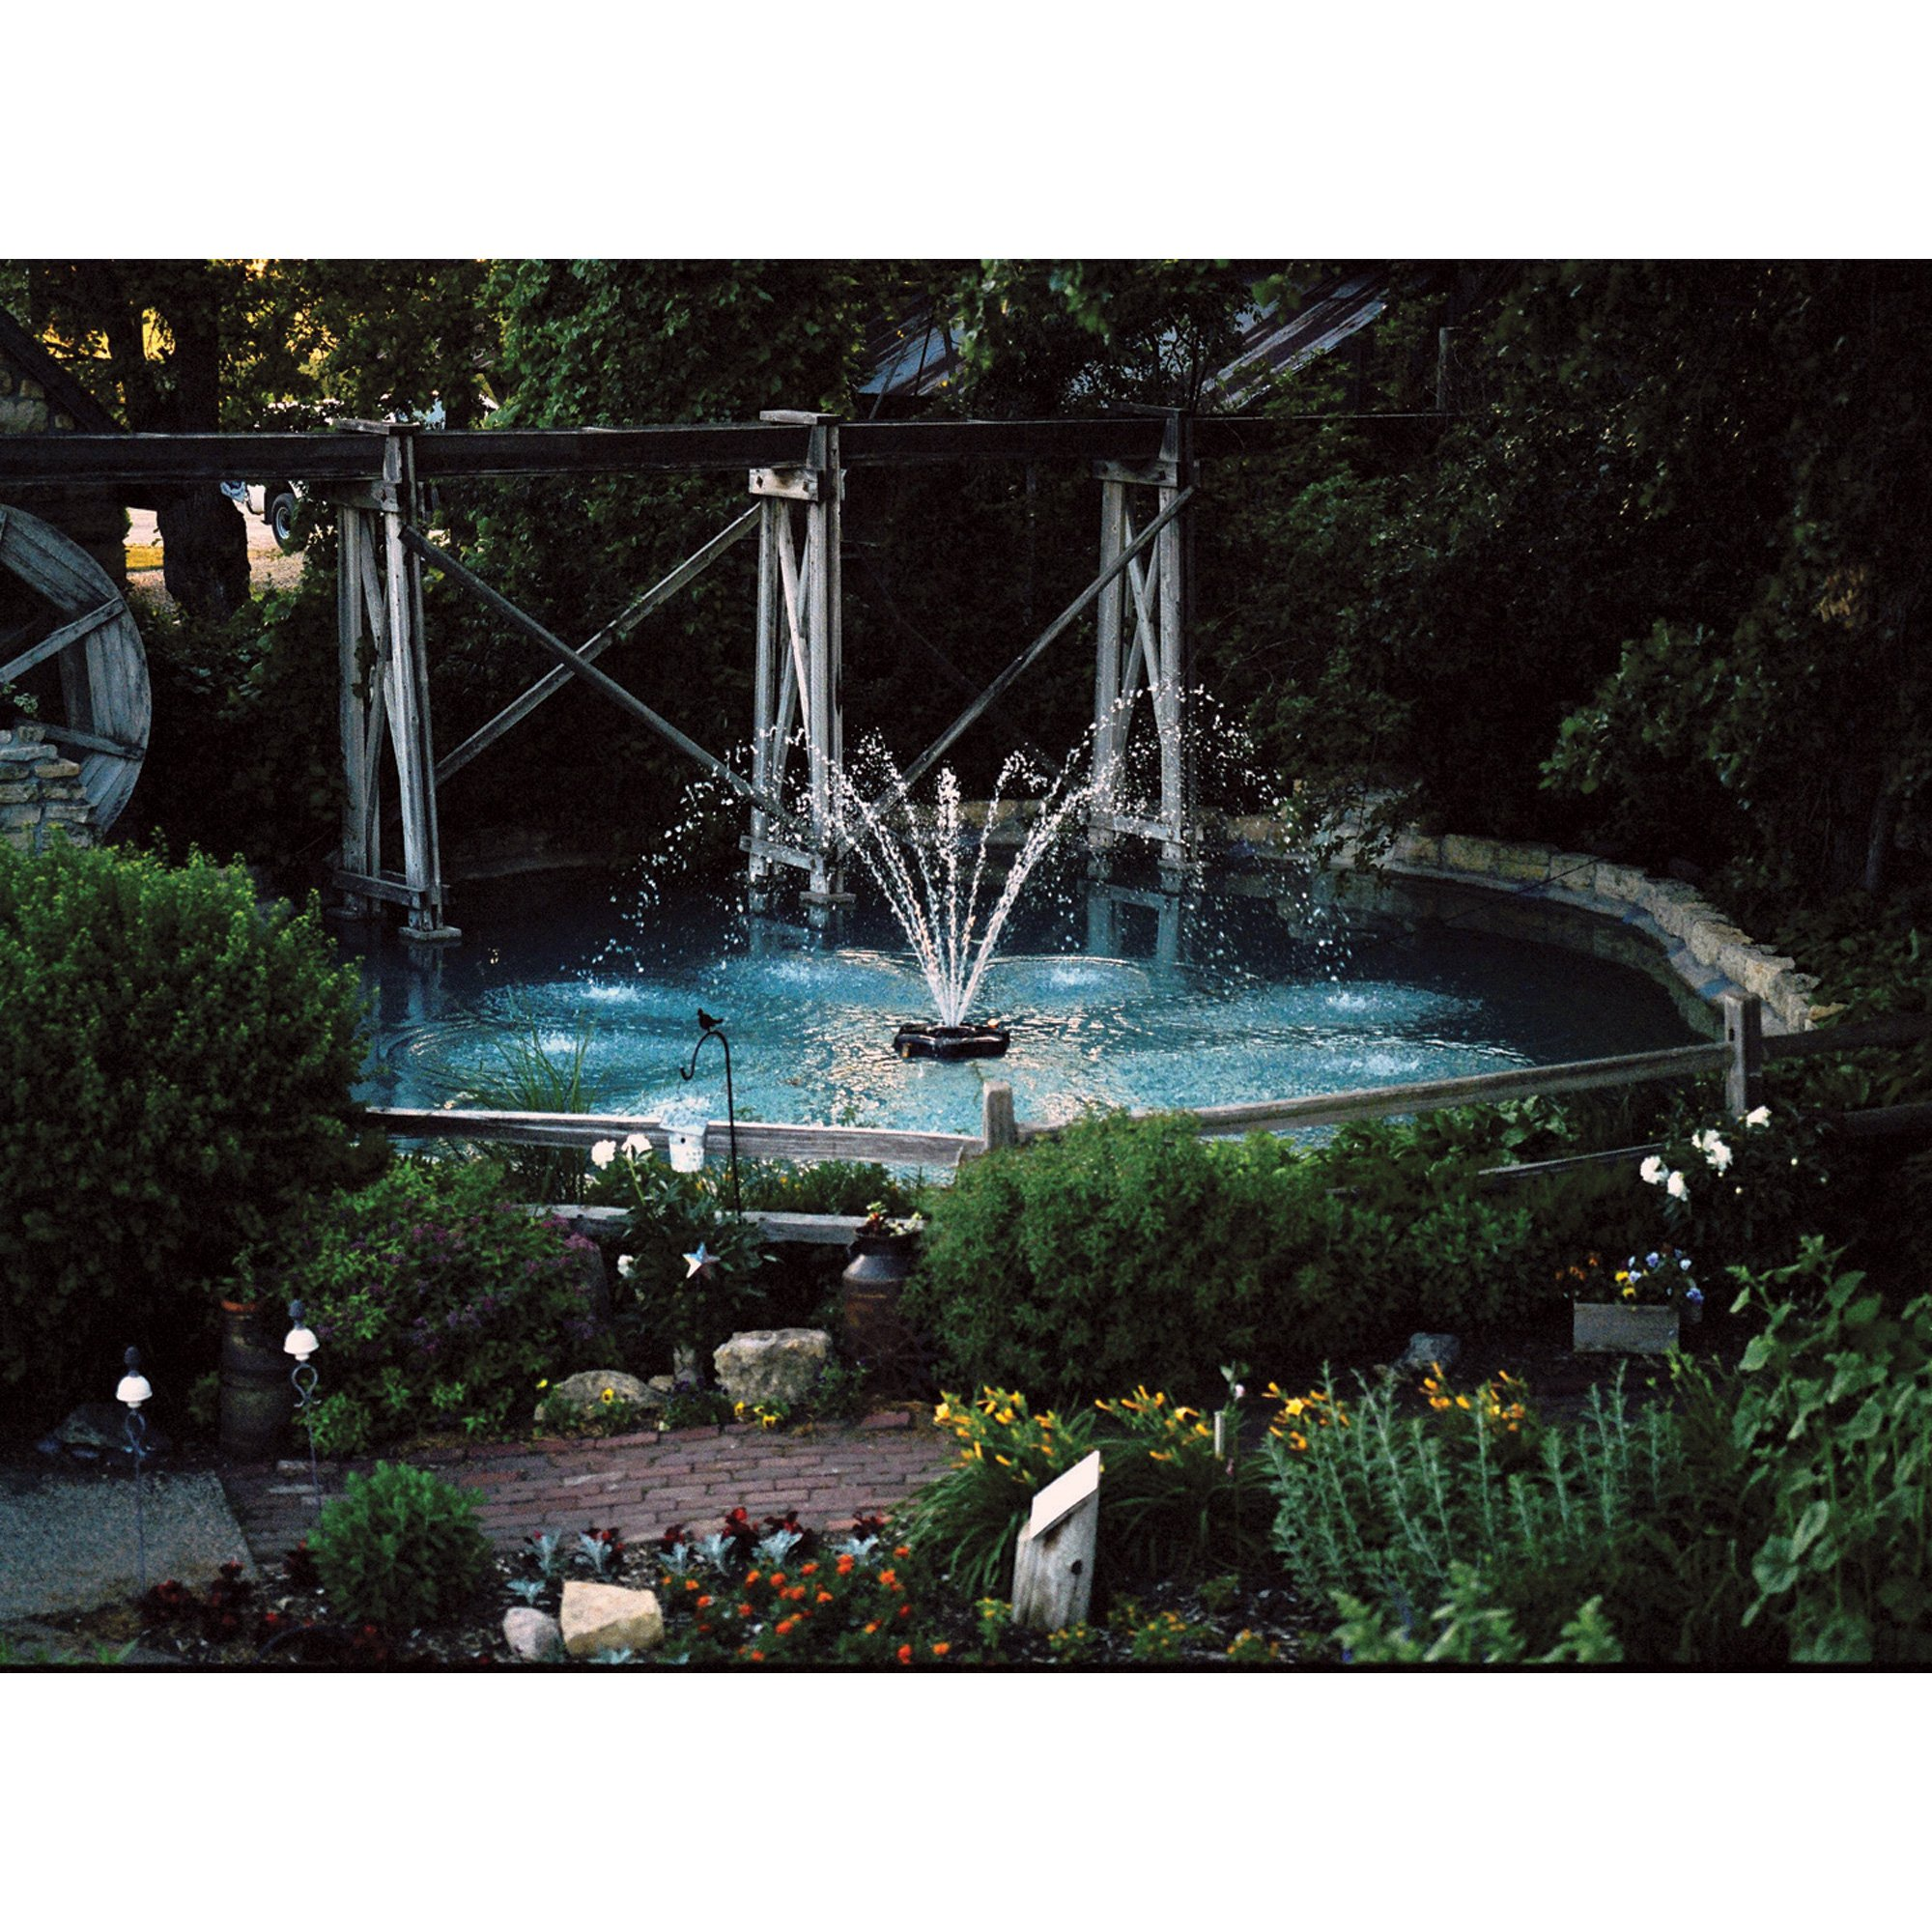 Kasco Aerating Fountain - 3/4 HP, 240V, 150-Ft. Cord, Model# 3400HJF150